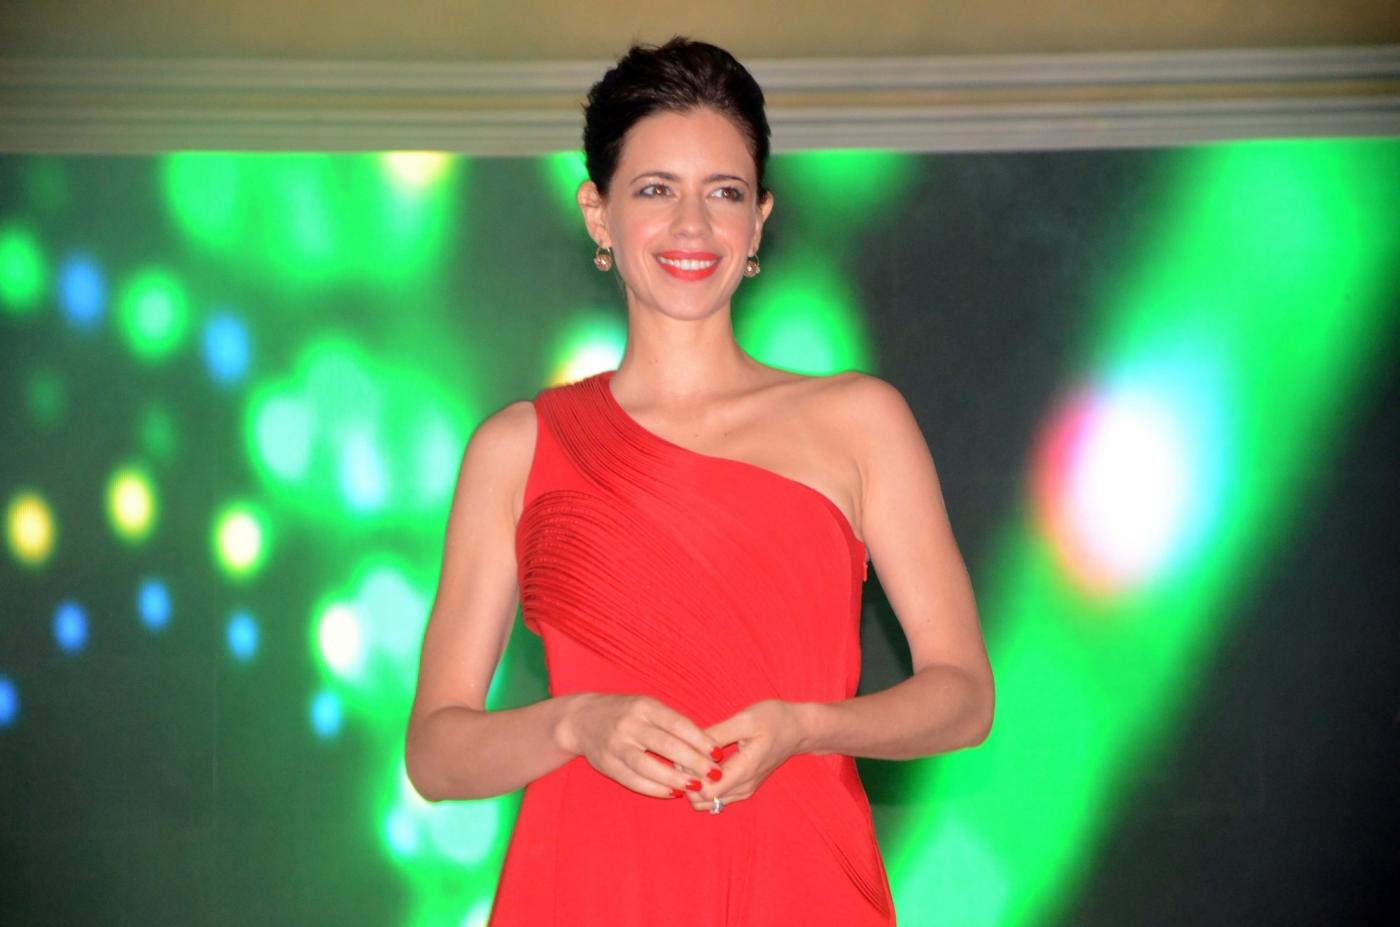 Mumbai: Actress Kalki Koechlin during a programme in Mumbai on Sept 12, 2017. (Photo: IANS) by .